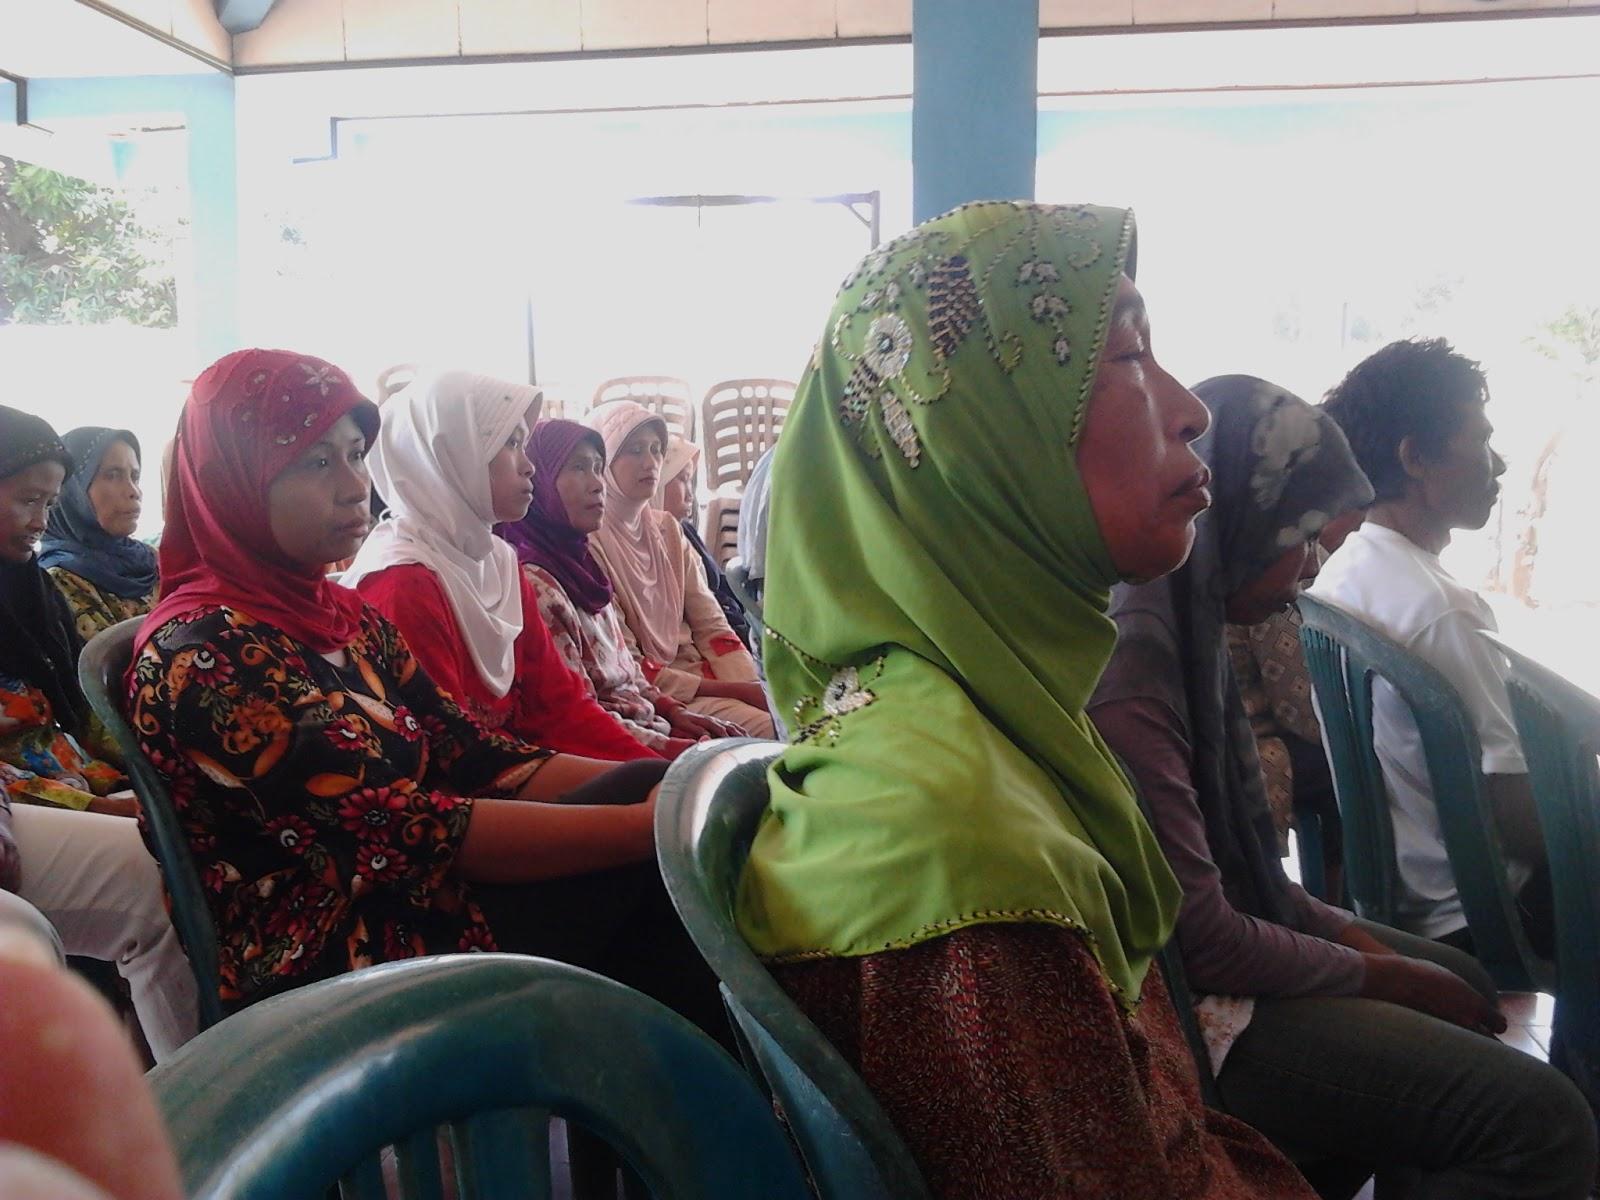 Situs Resmi Pemerintah Desa Gosari 2012 Stop Babs Open Defacation